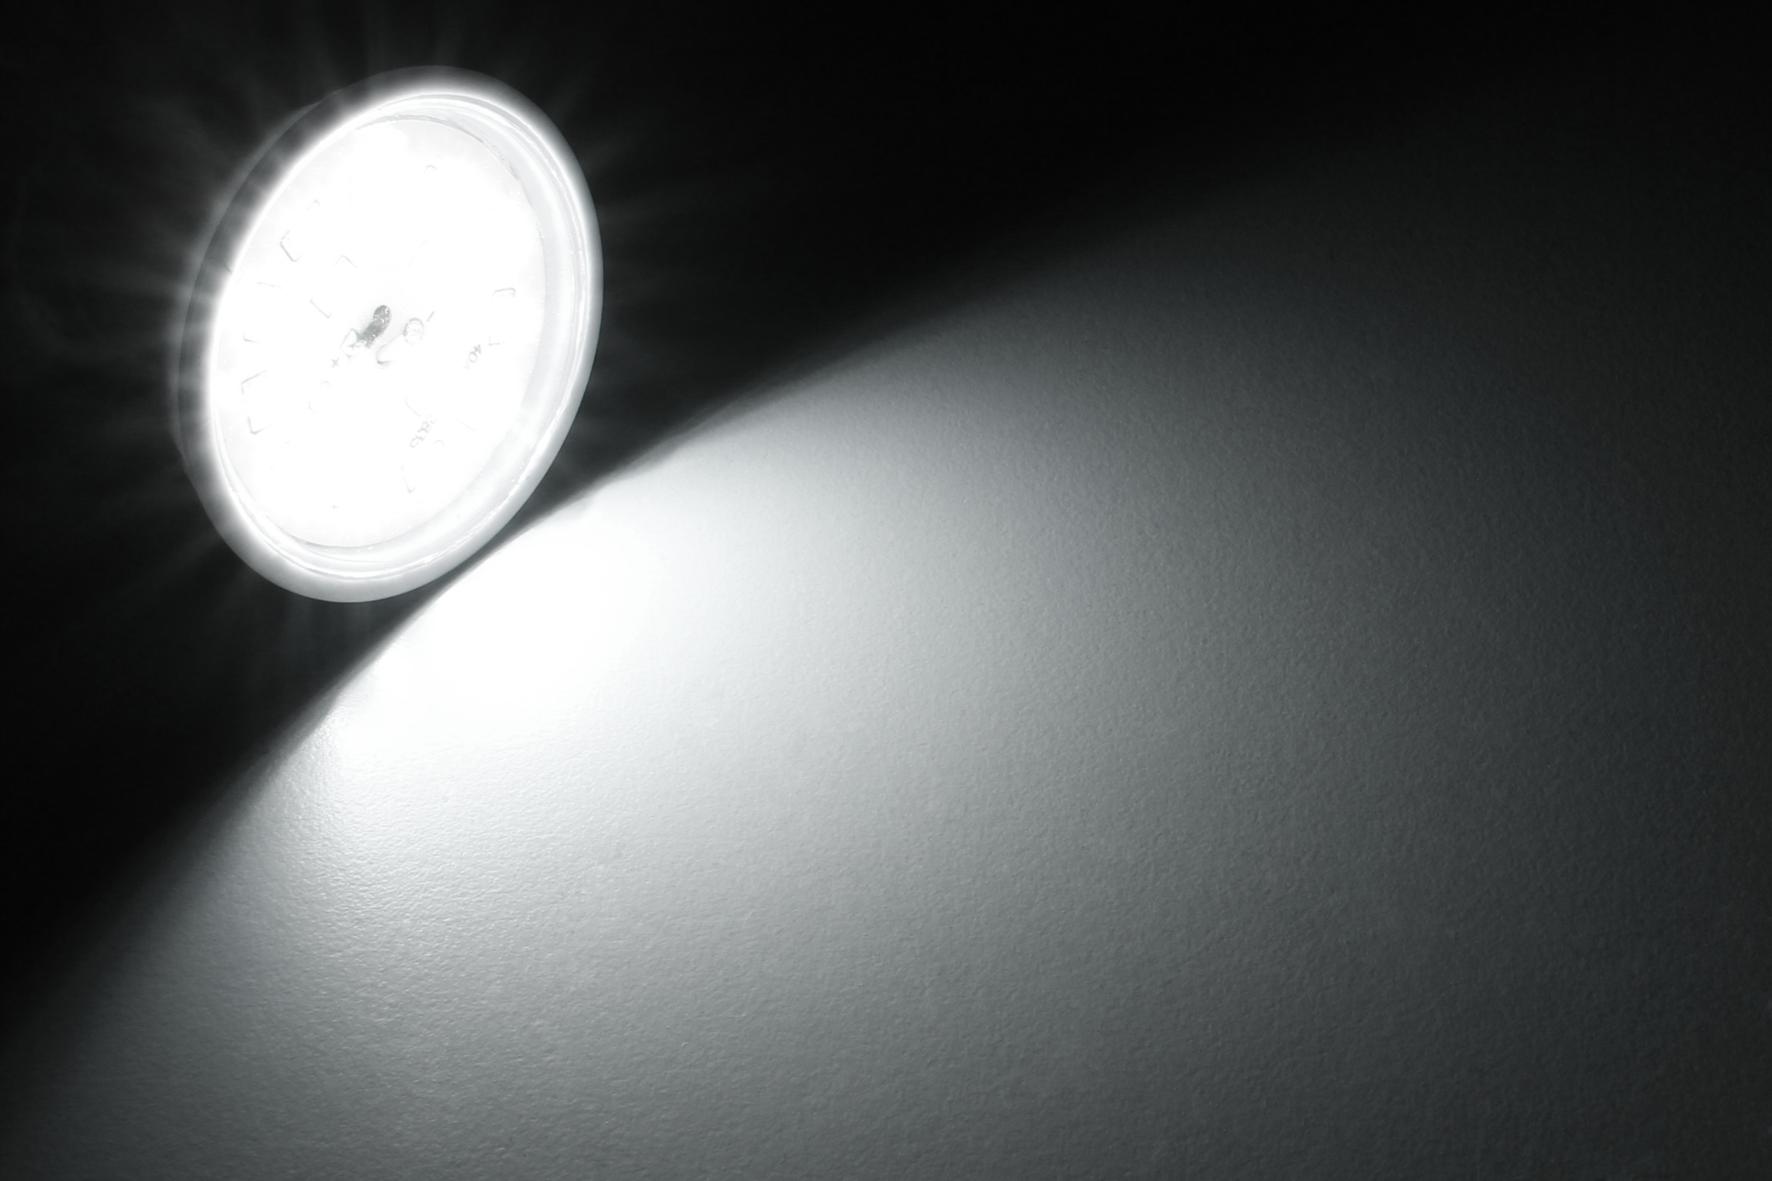 LED-Strahler McShine ''ET50'', GU10, 5W, 400 lm, neutralweiß